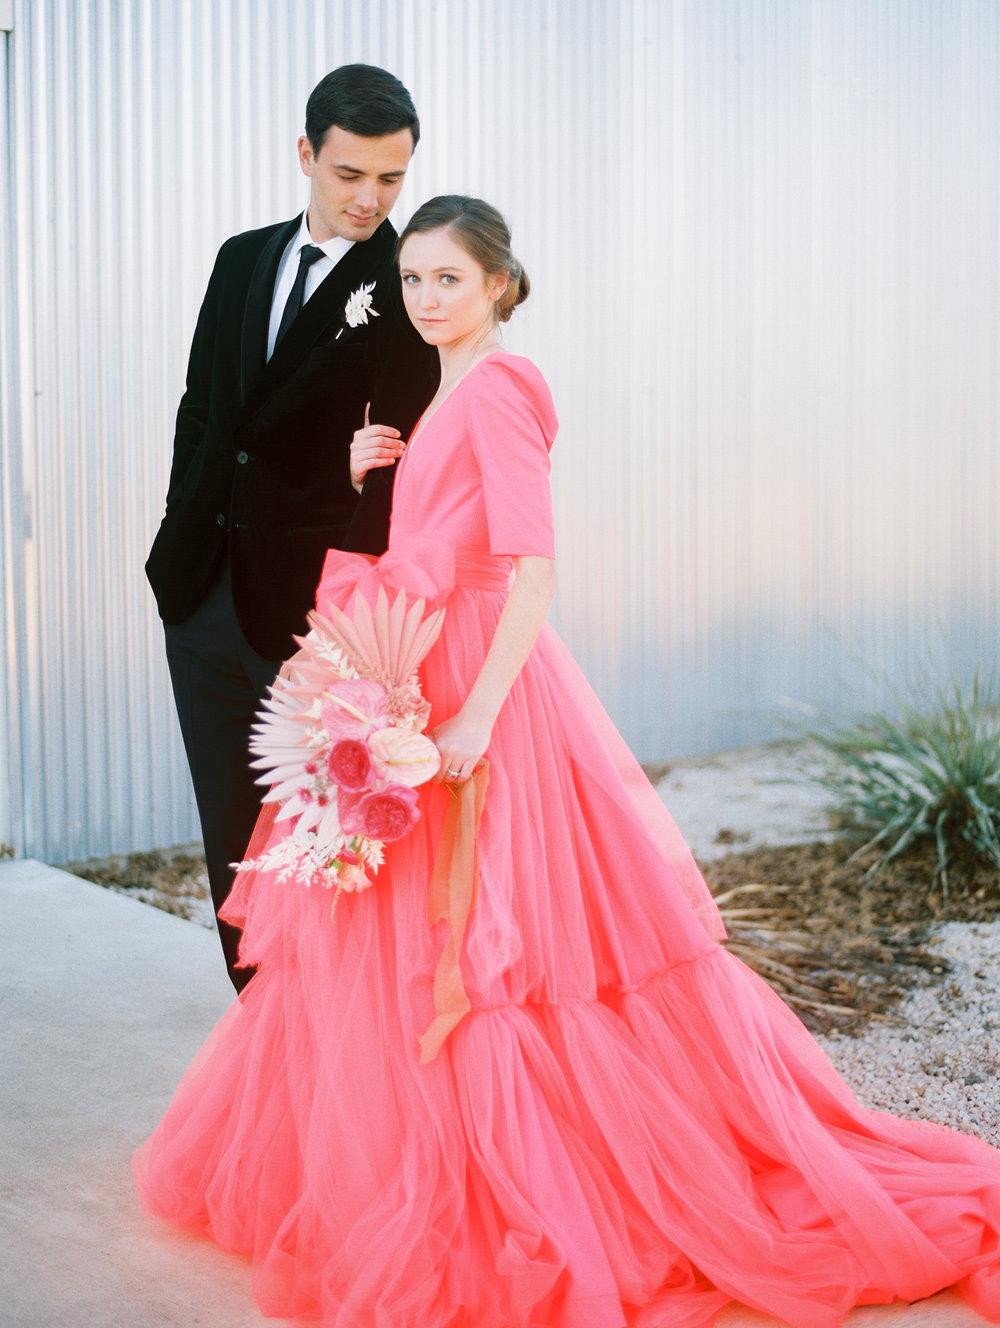 Kristin-La-Voie-Photography-Austin-Wedding-Photographer-Prospect-House-44.jpg